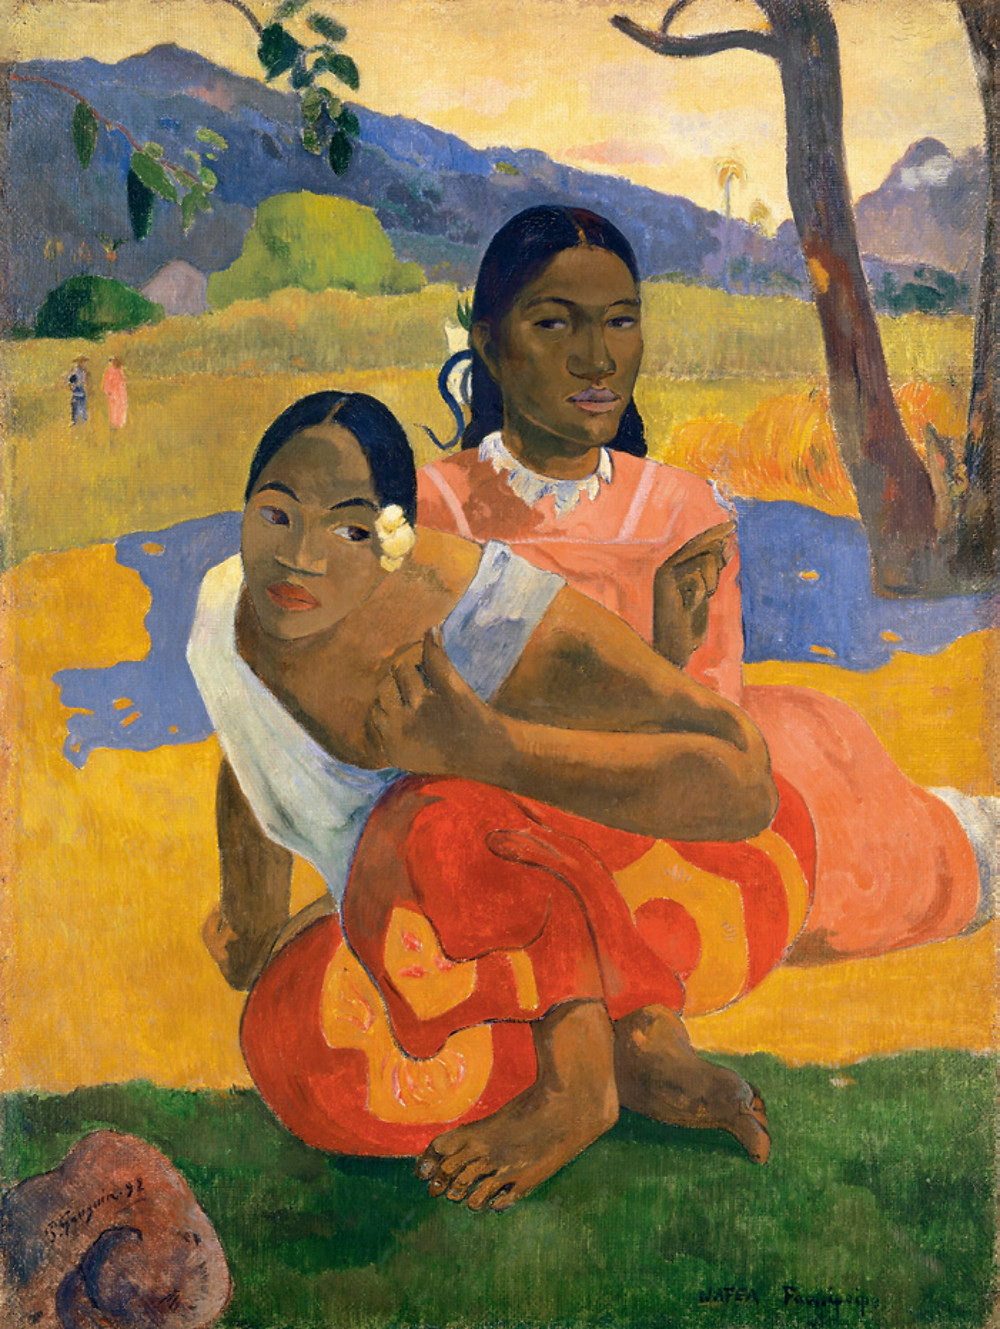 nafea faa ipoipo paul gauguin painting